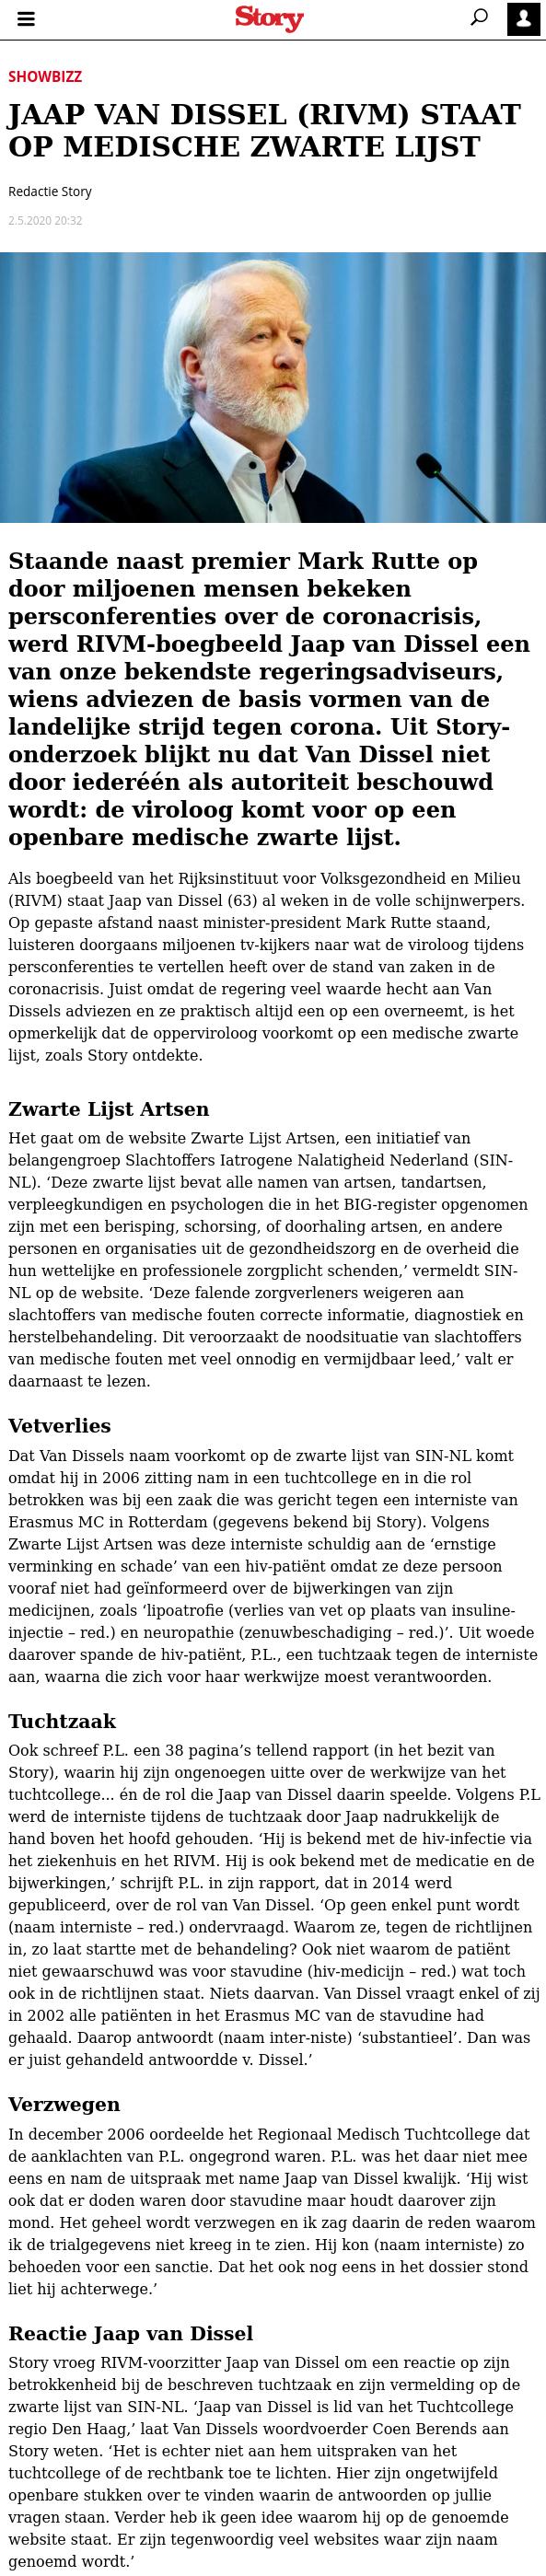 [Afbeelding: Fire-Shot-Capture-137-Jaap-van-Dissel-RI...ory-nl.png]